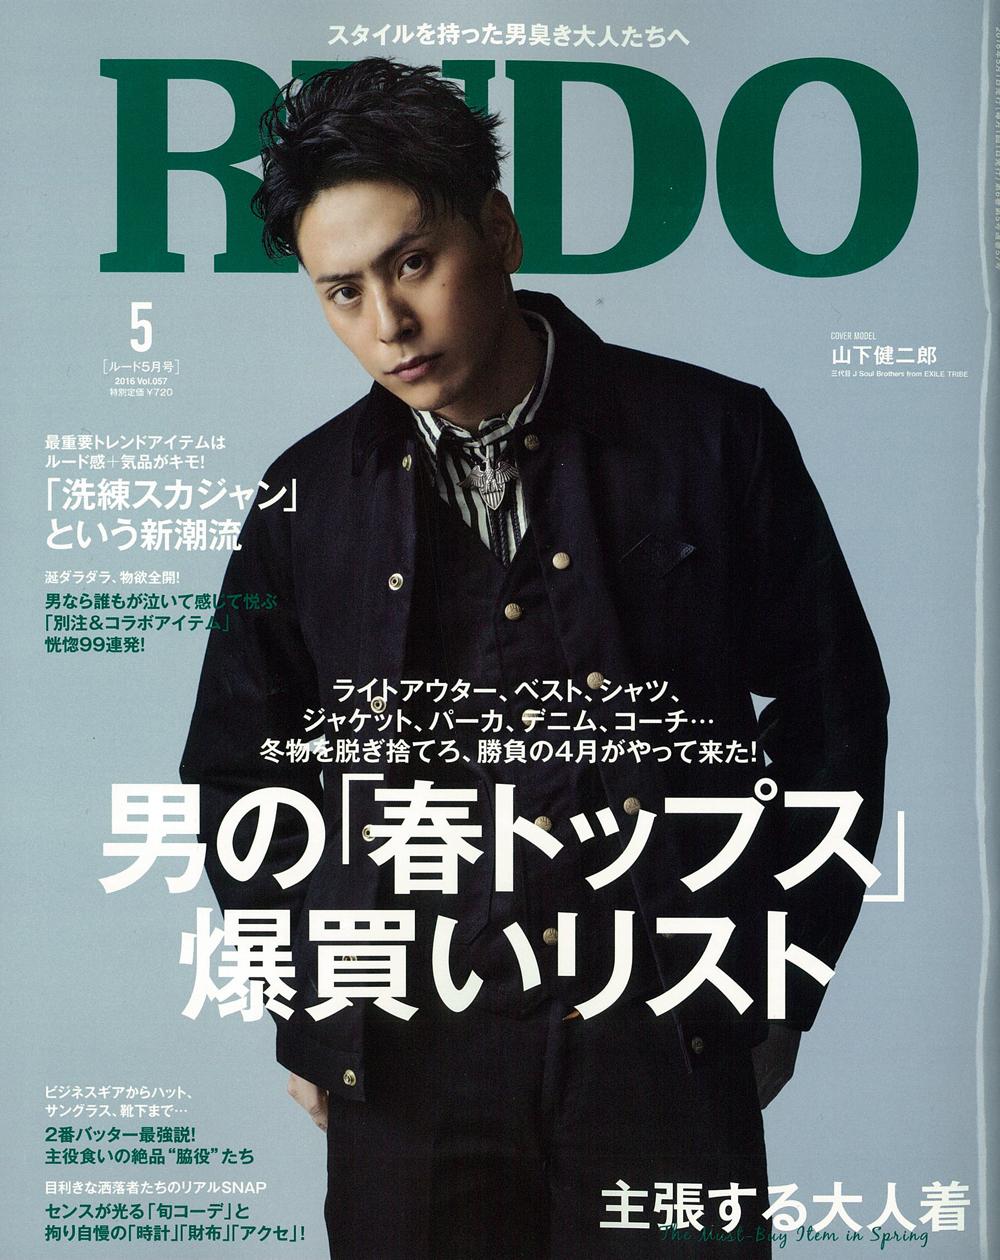 RUDO 5月号掲載